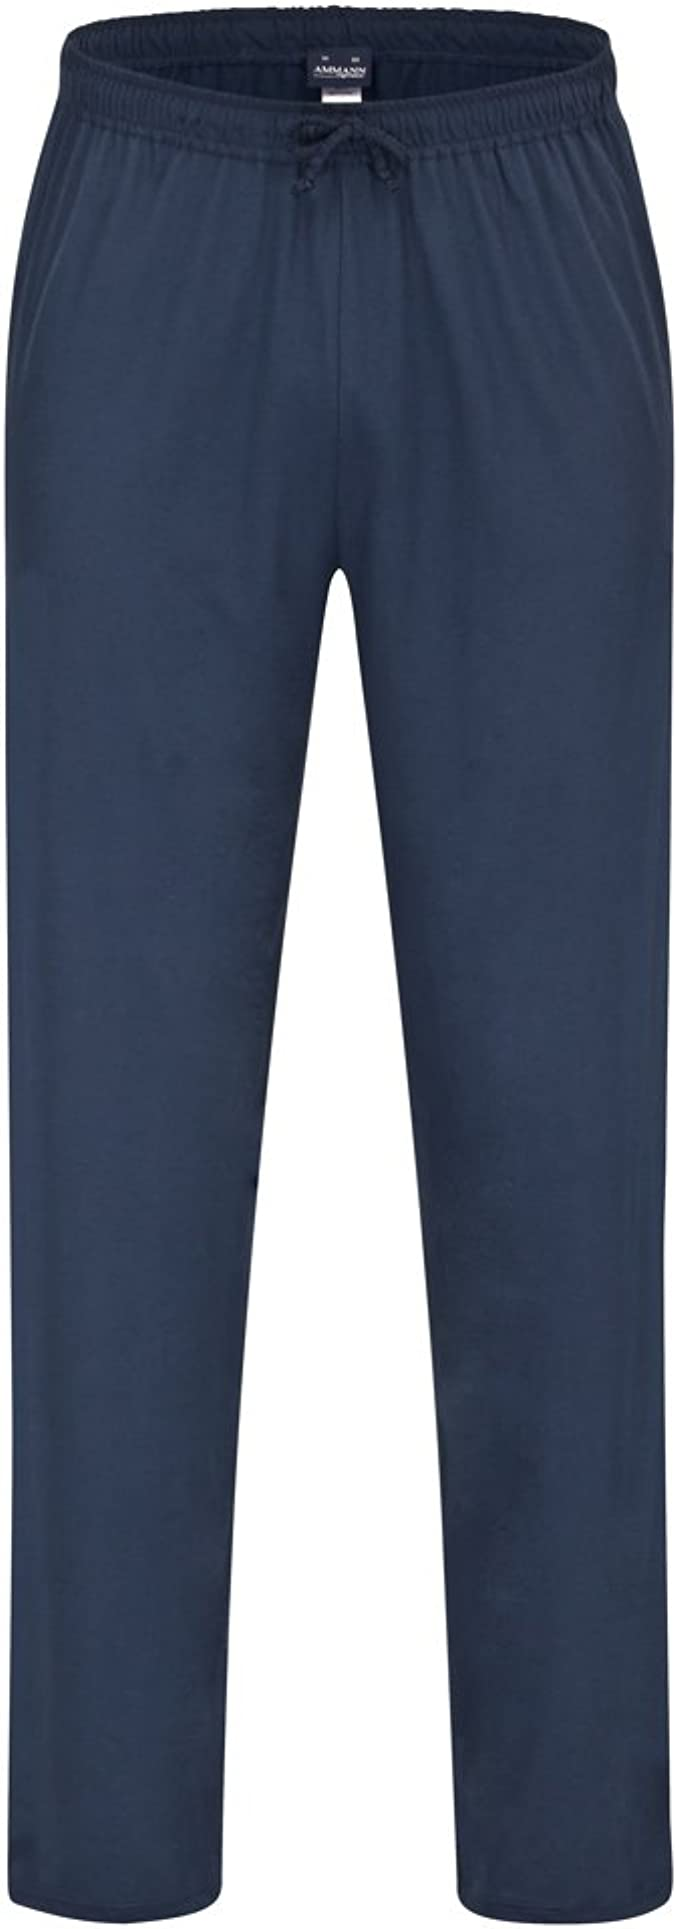 AMMANN Herren Schlafanzug Shirt langarm und V-Ausschnitt Mix /& Match